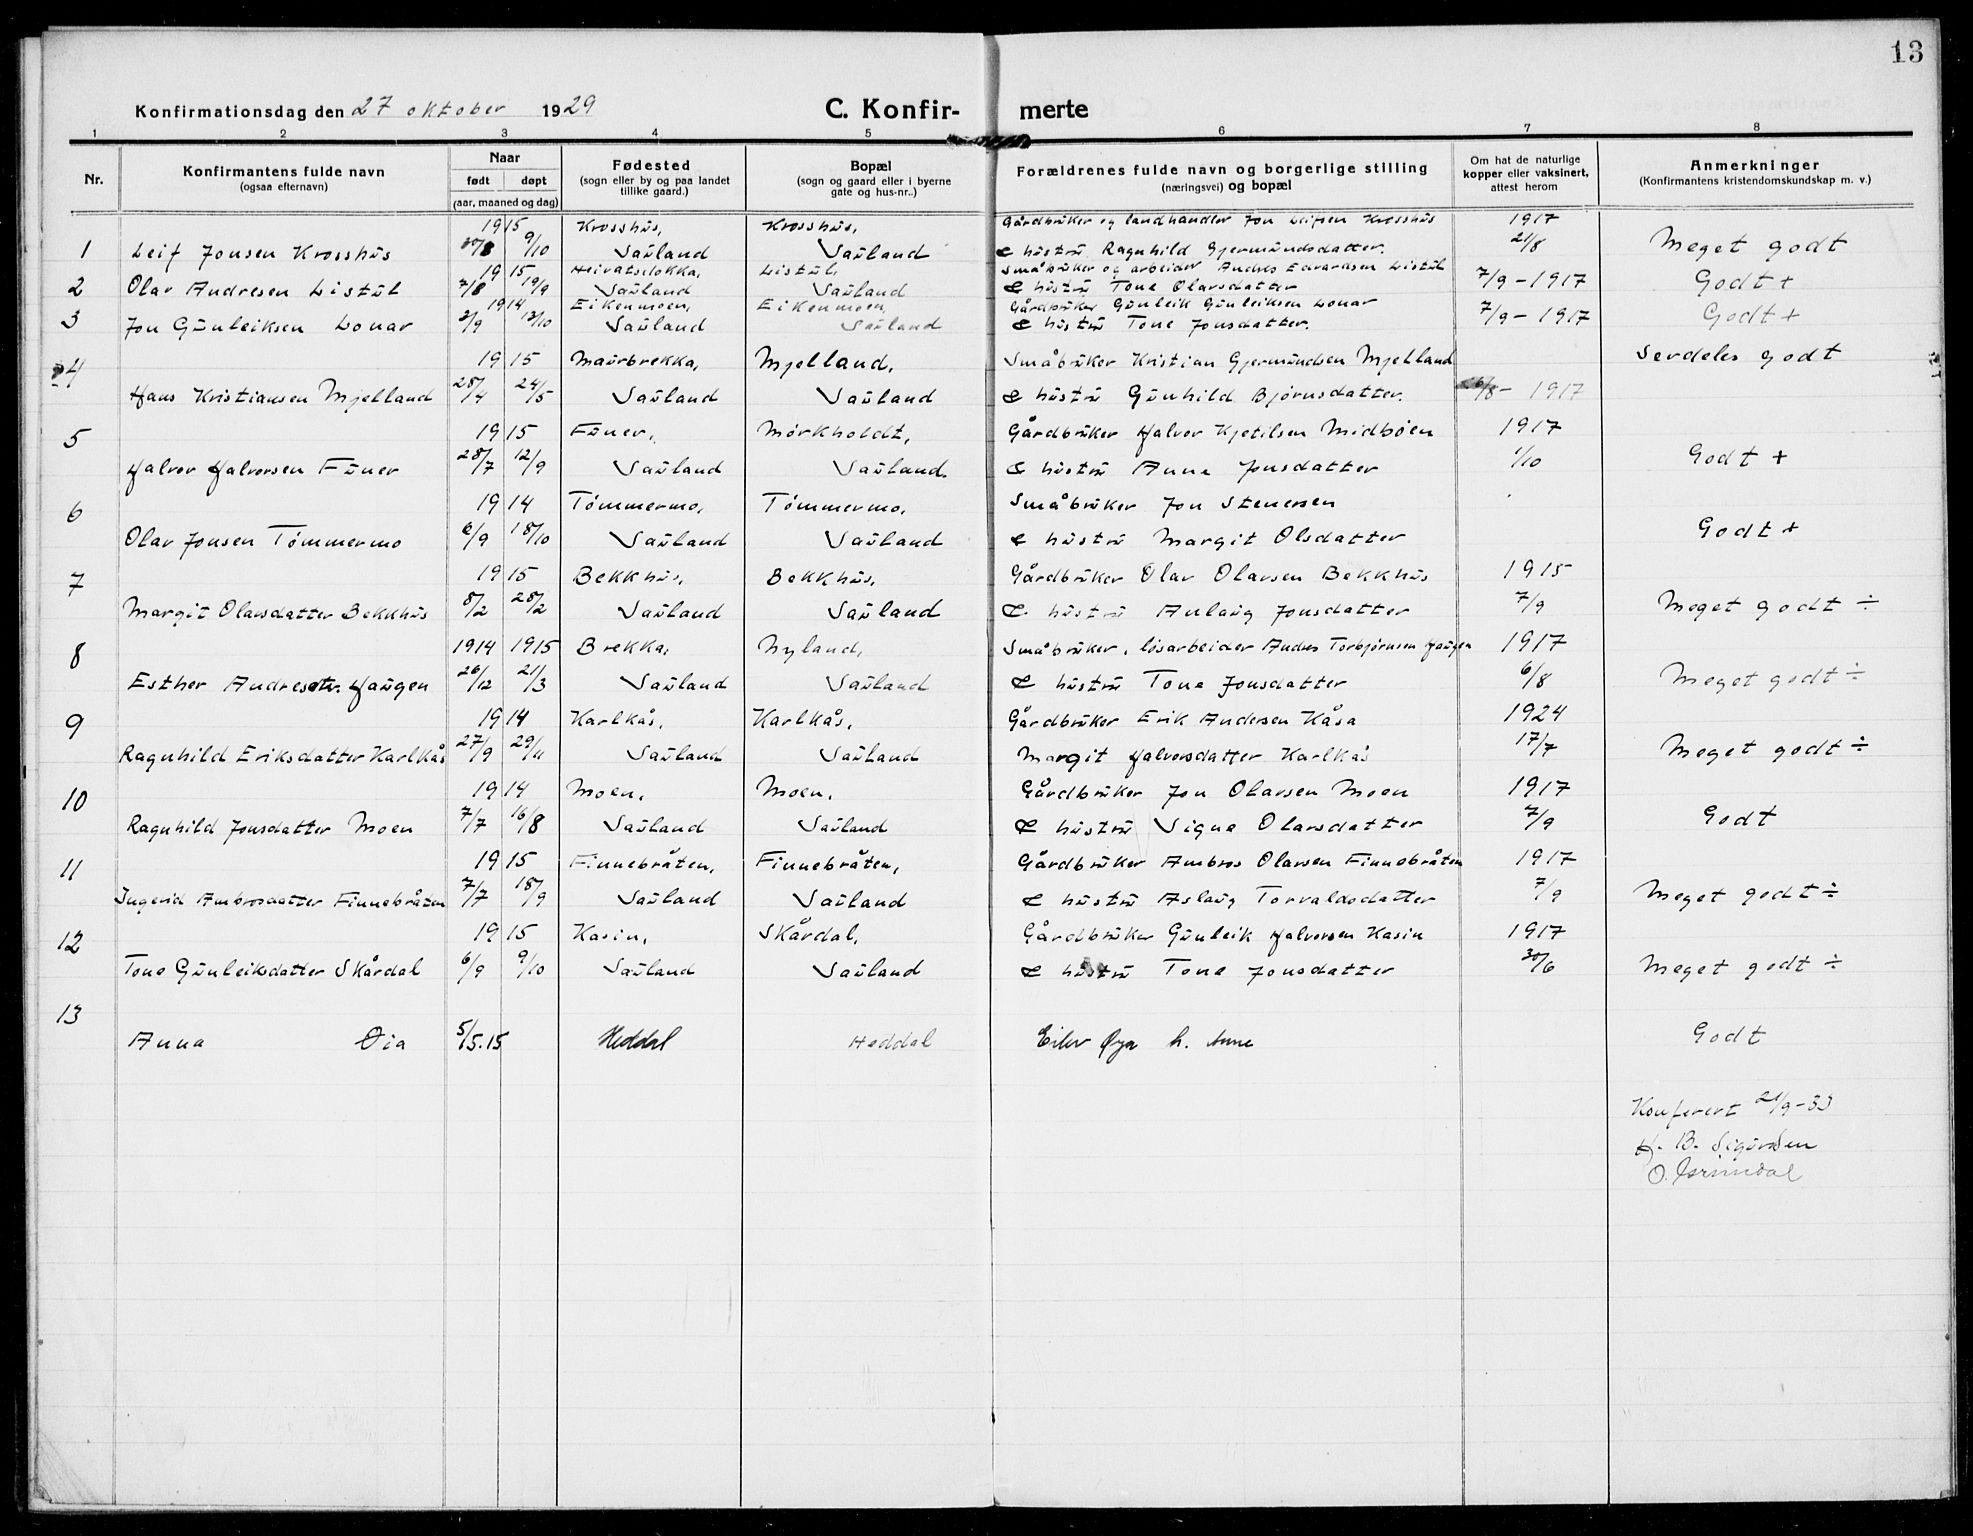 SAKO, Hjartdal kirkebøker, F/Fb/L0003: Ministerialbok nr. II 3, 1920-1932, s. 13